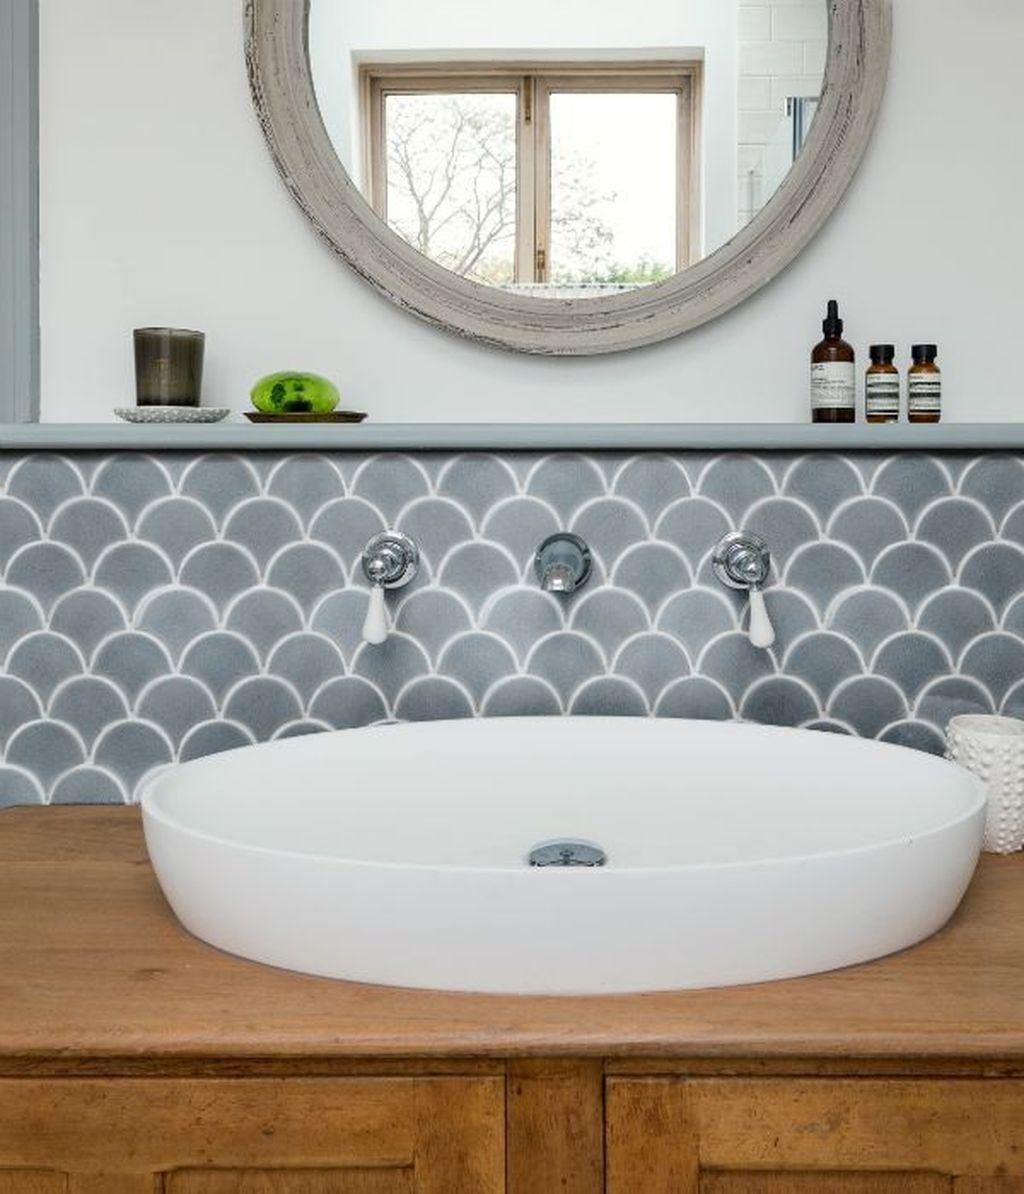 Inspiring Unique Bathroom Ideas That You Should Try 29